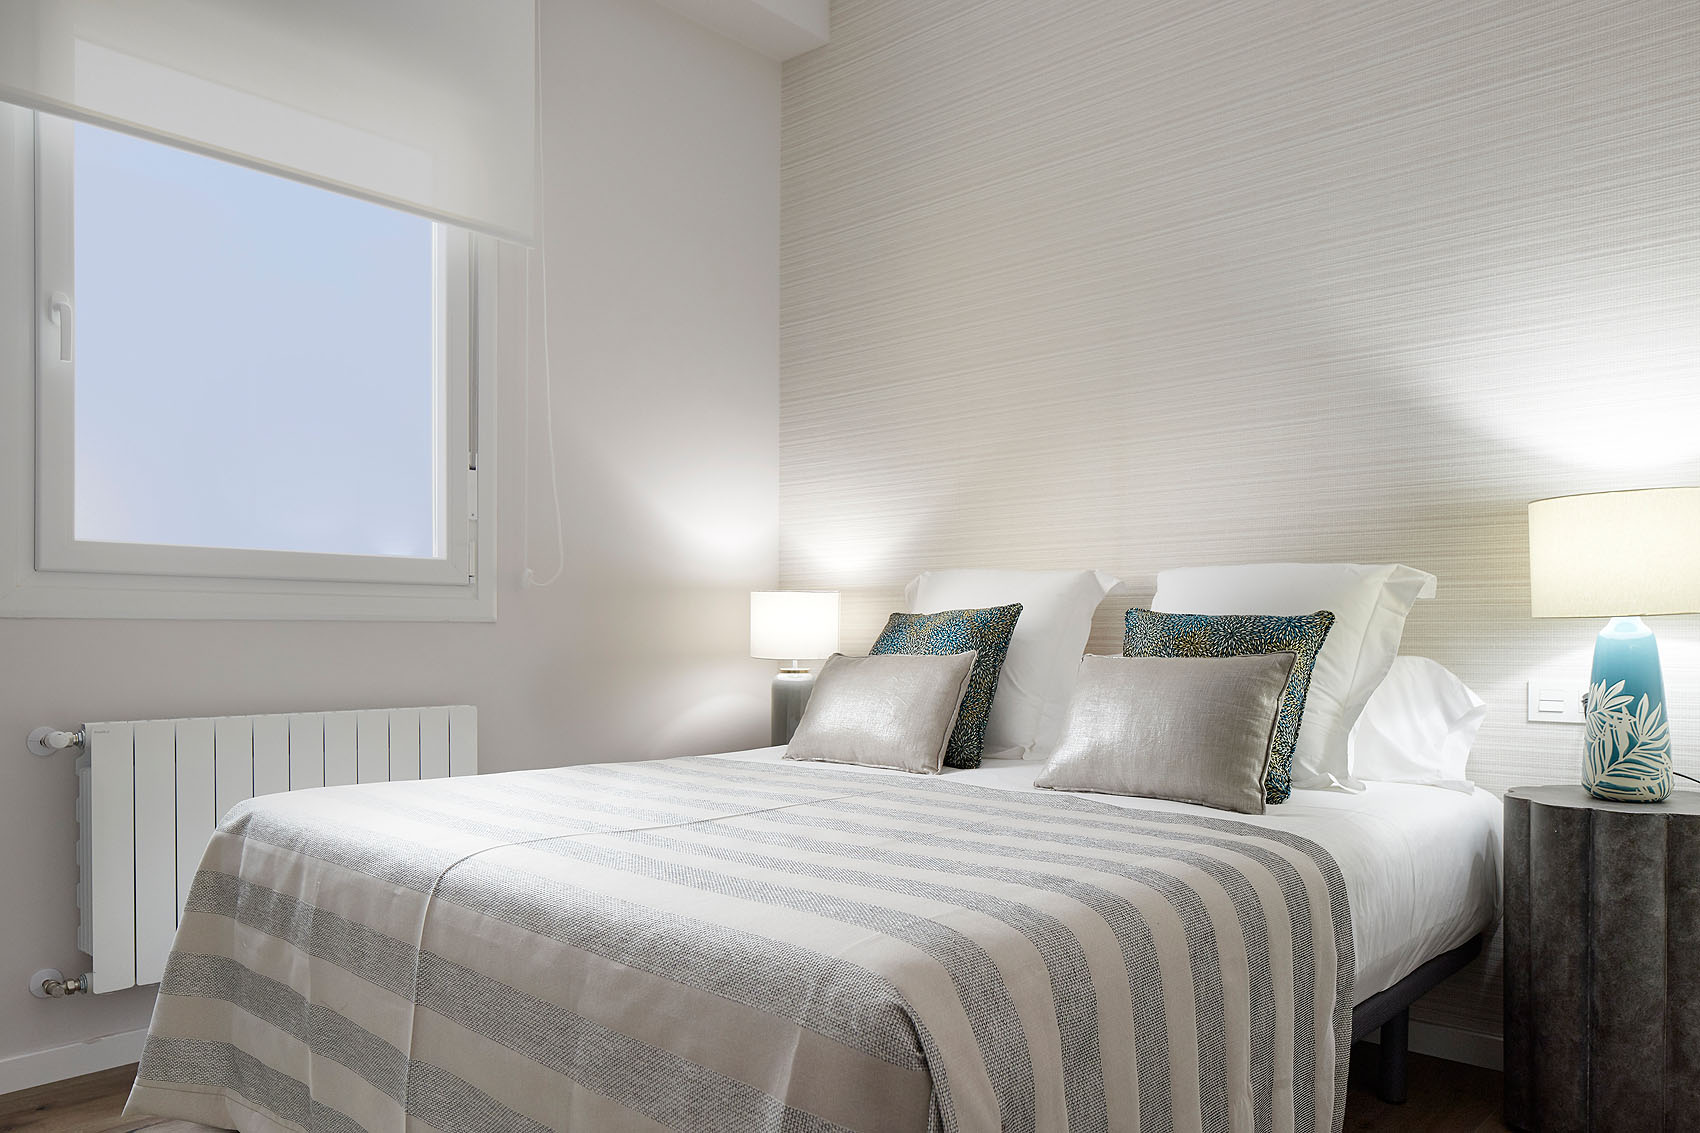 Apartamento Turistico Gran Vía - Iñaki Caperochipi - Fotografía